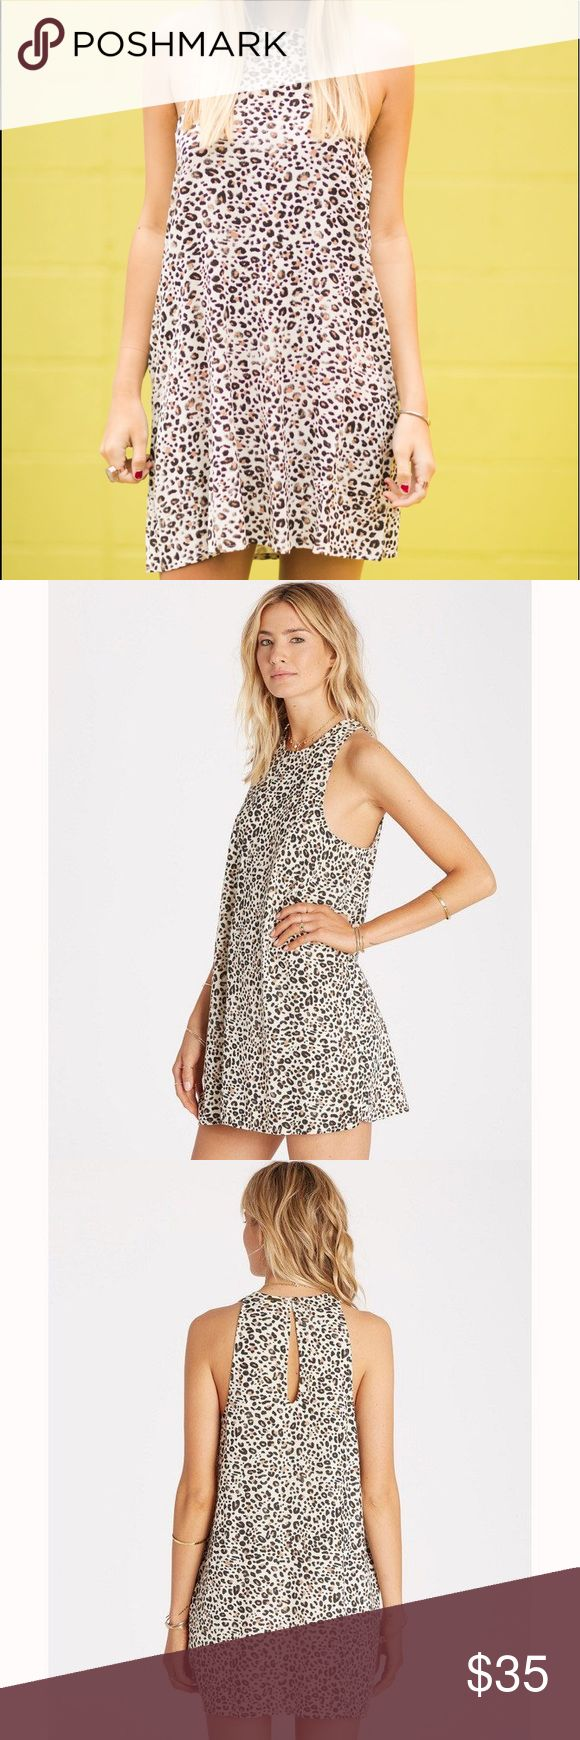 "• cheetah print dress • * High neck swing dress. * Keyhole at back. * Allover print. * Pattern: animal or bohemian print. * Material: 100% rayon. * Chest: 32"". * Waist: 25"". * Hips: 35"". Billabong Dresses Mini"